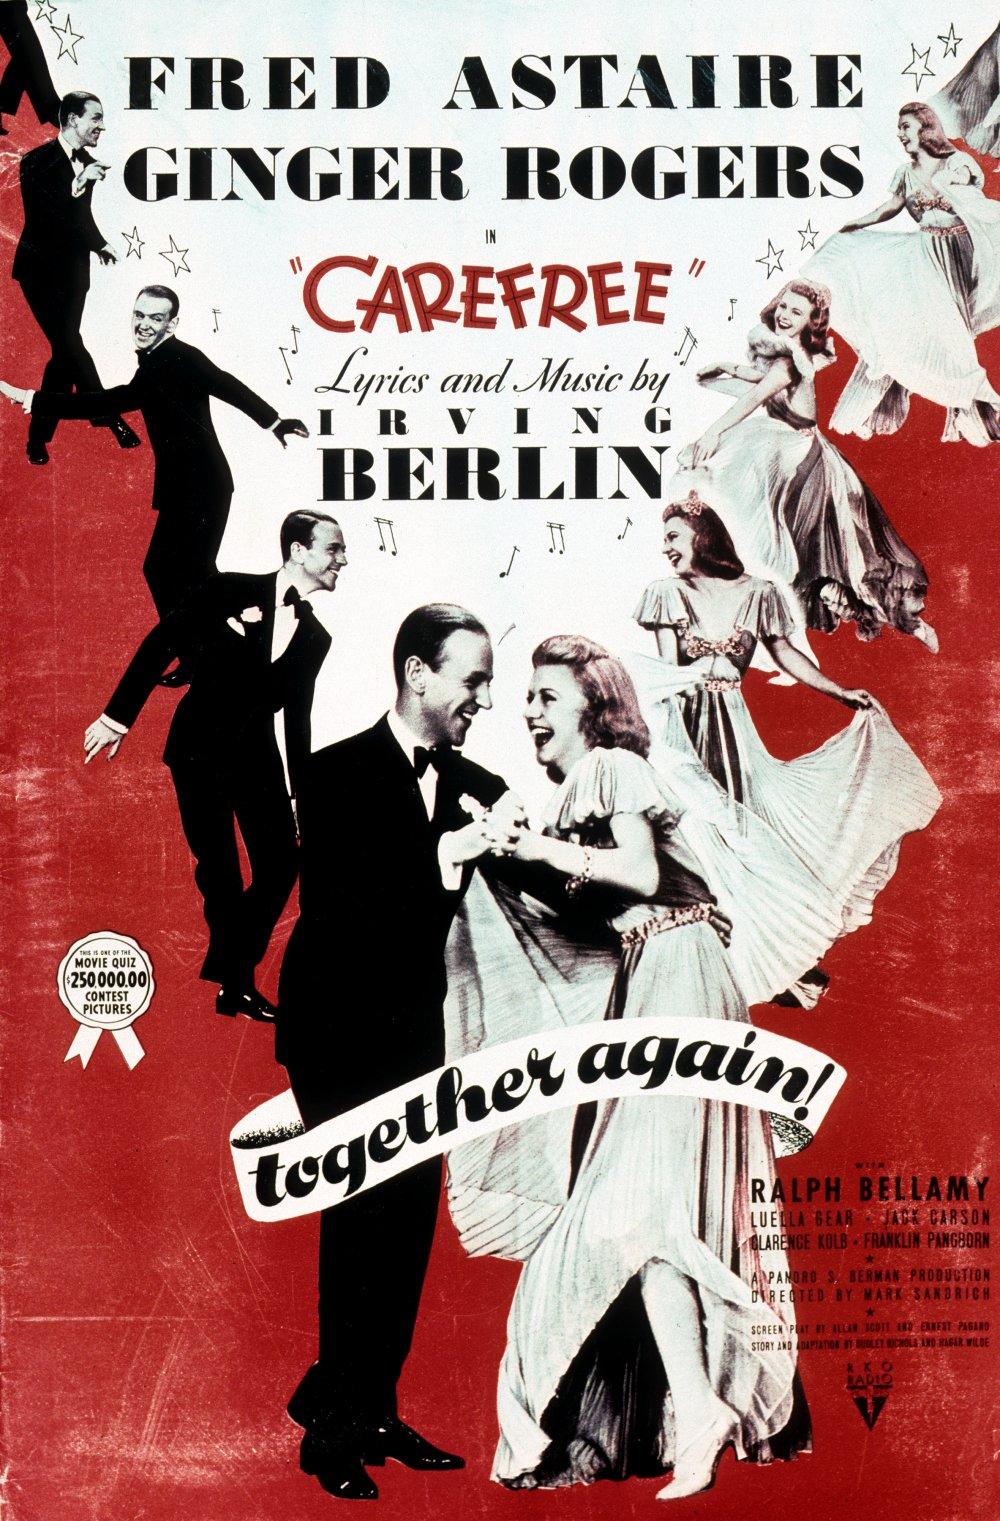 Carefree (1938) film poster